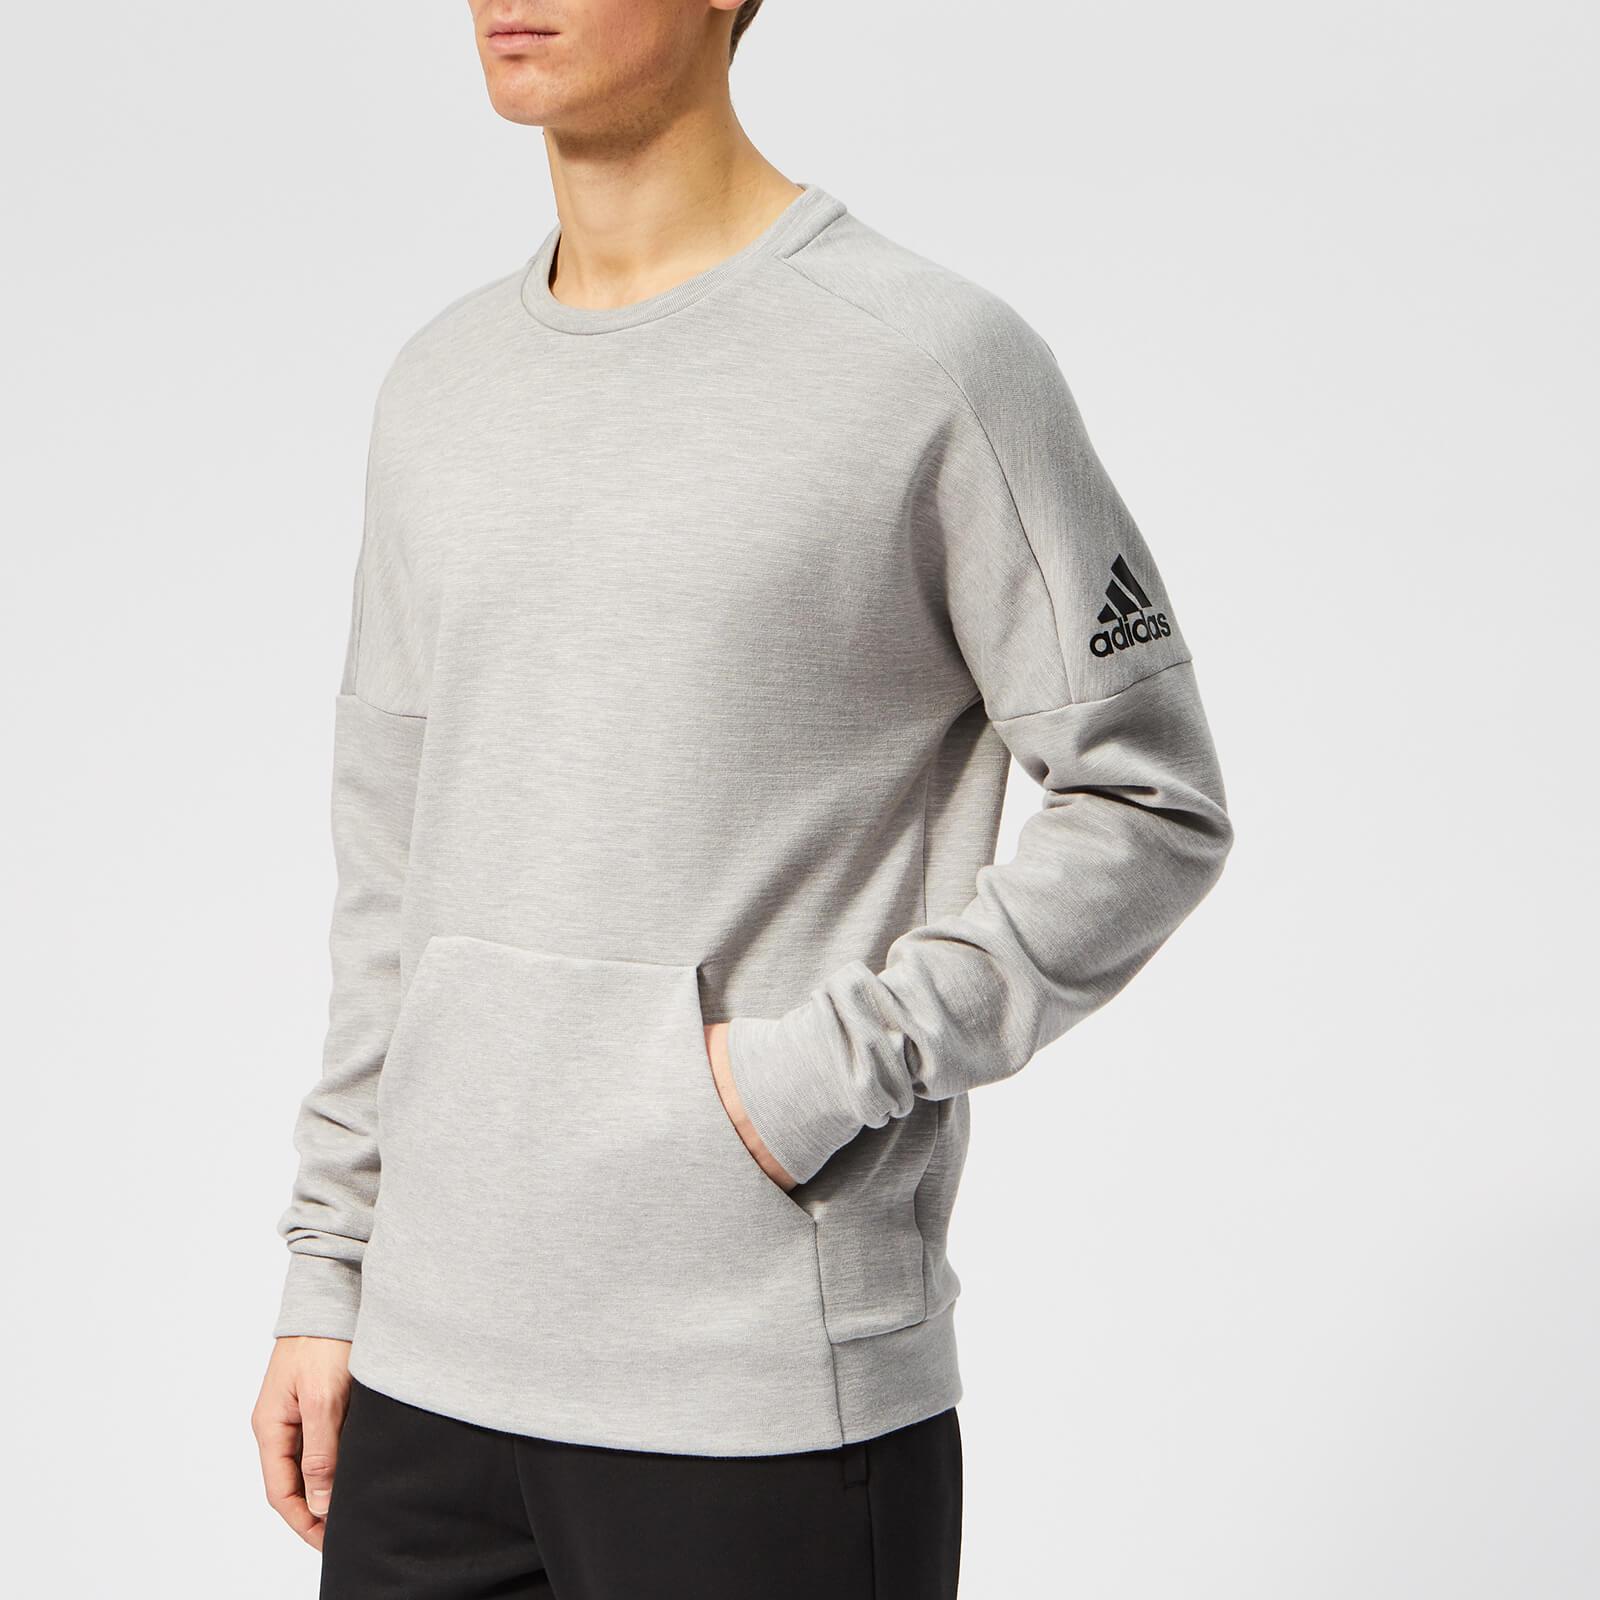 adidas Men's ID Stadium Crew Neck Sweatshirt - Grey Heather - S - Grey